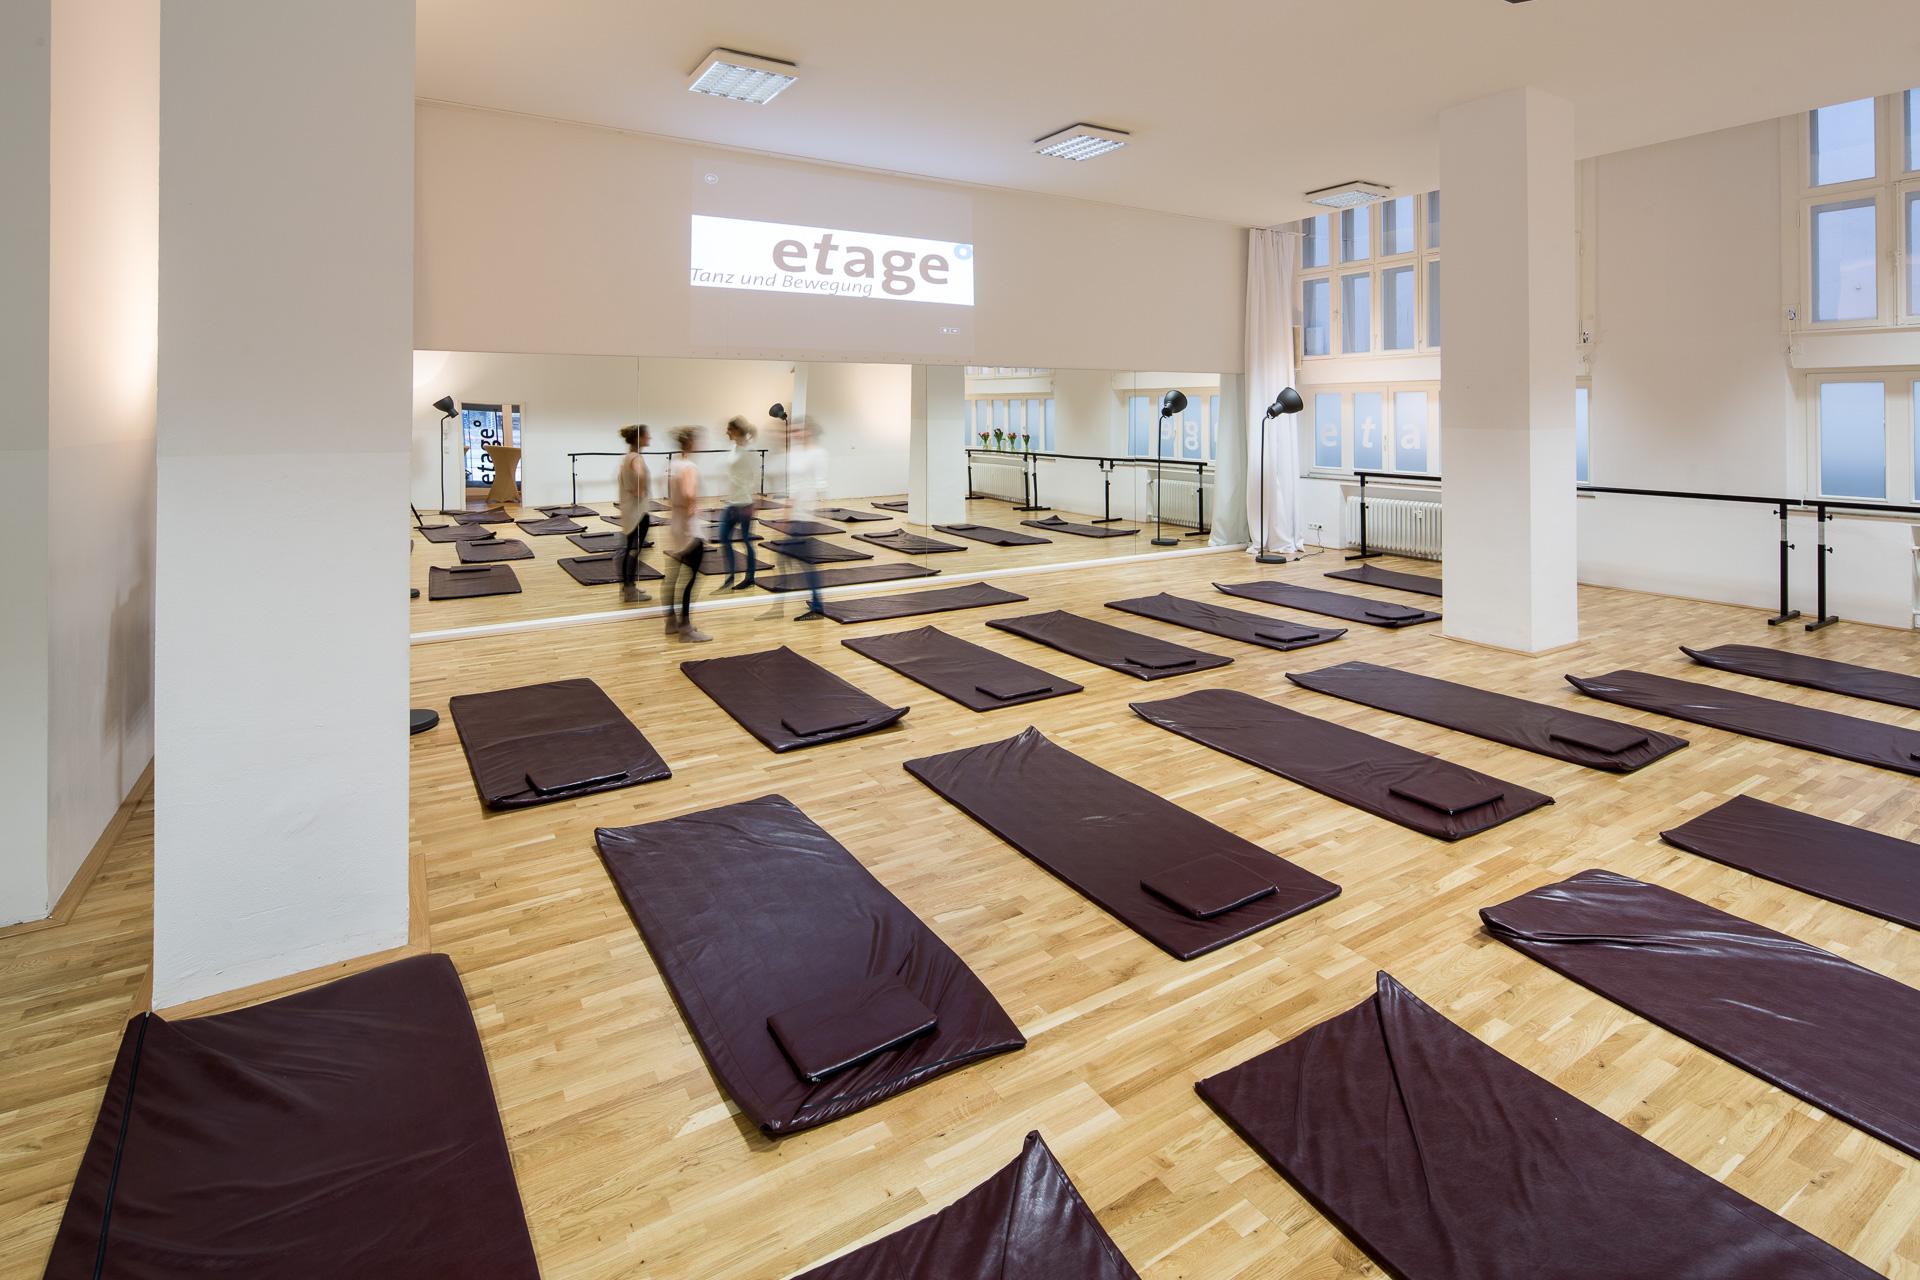 Raum mieten in Bremen: Seminar, Coaching, Workshop, Tagung